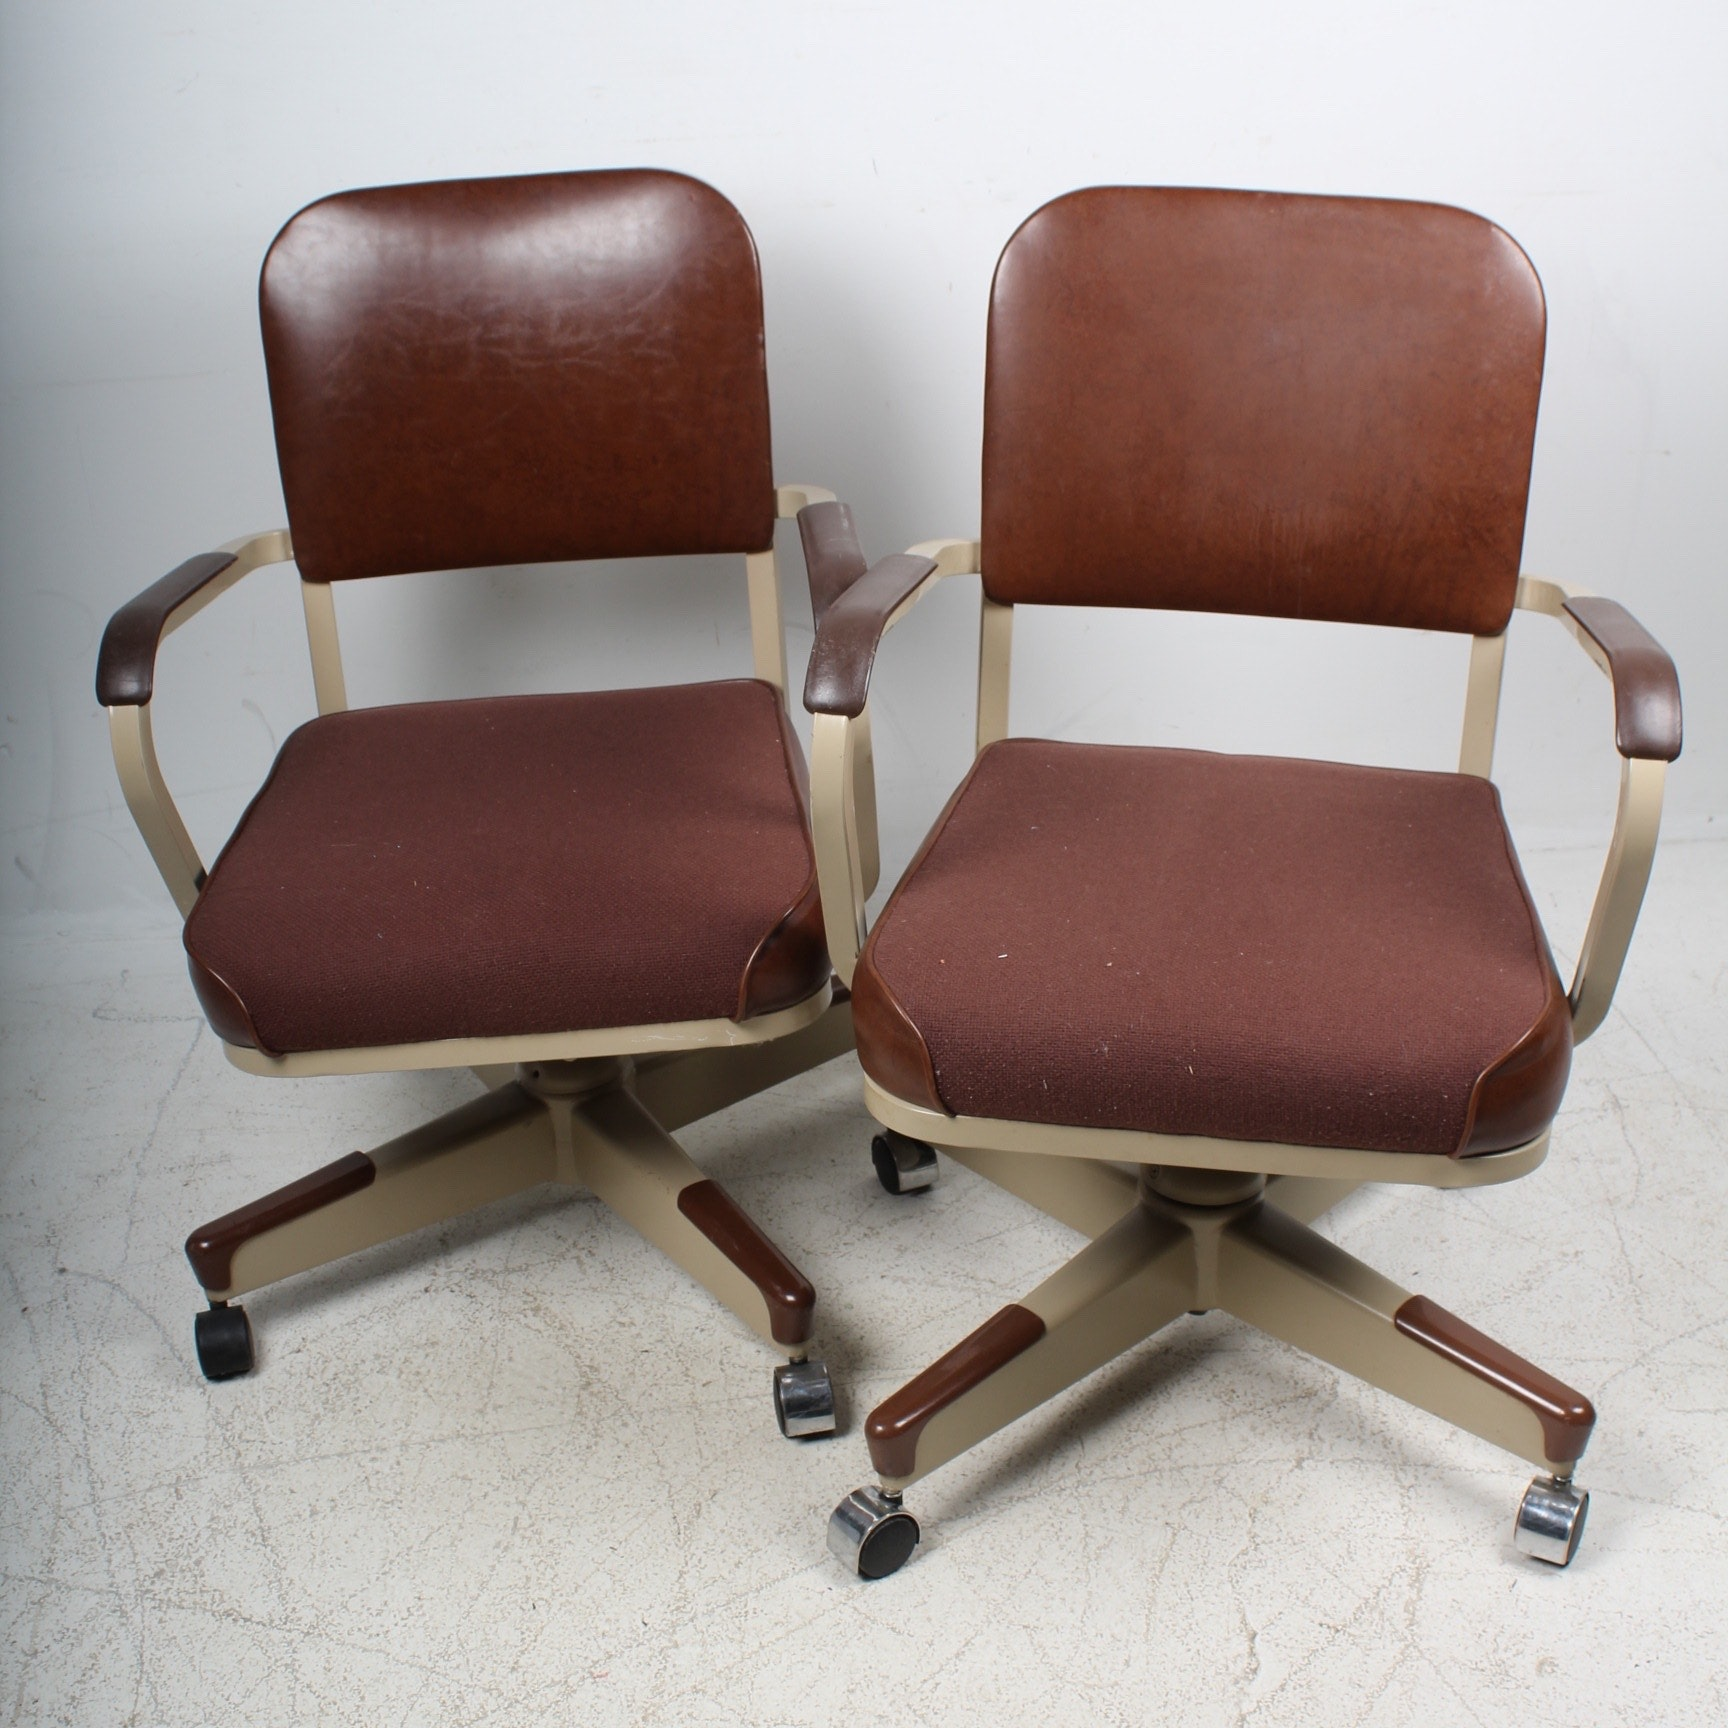 Vintage Desk Chairs